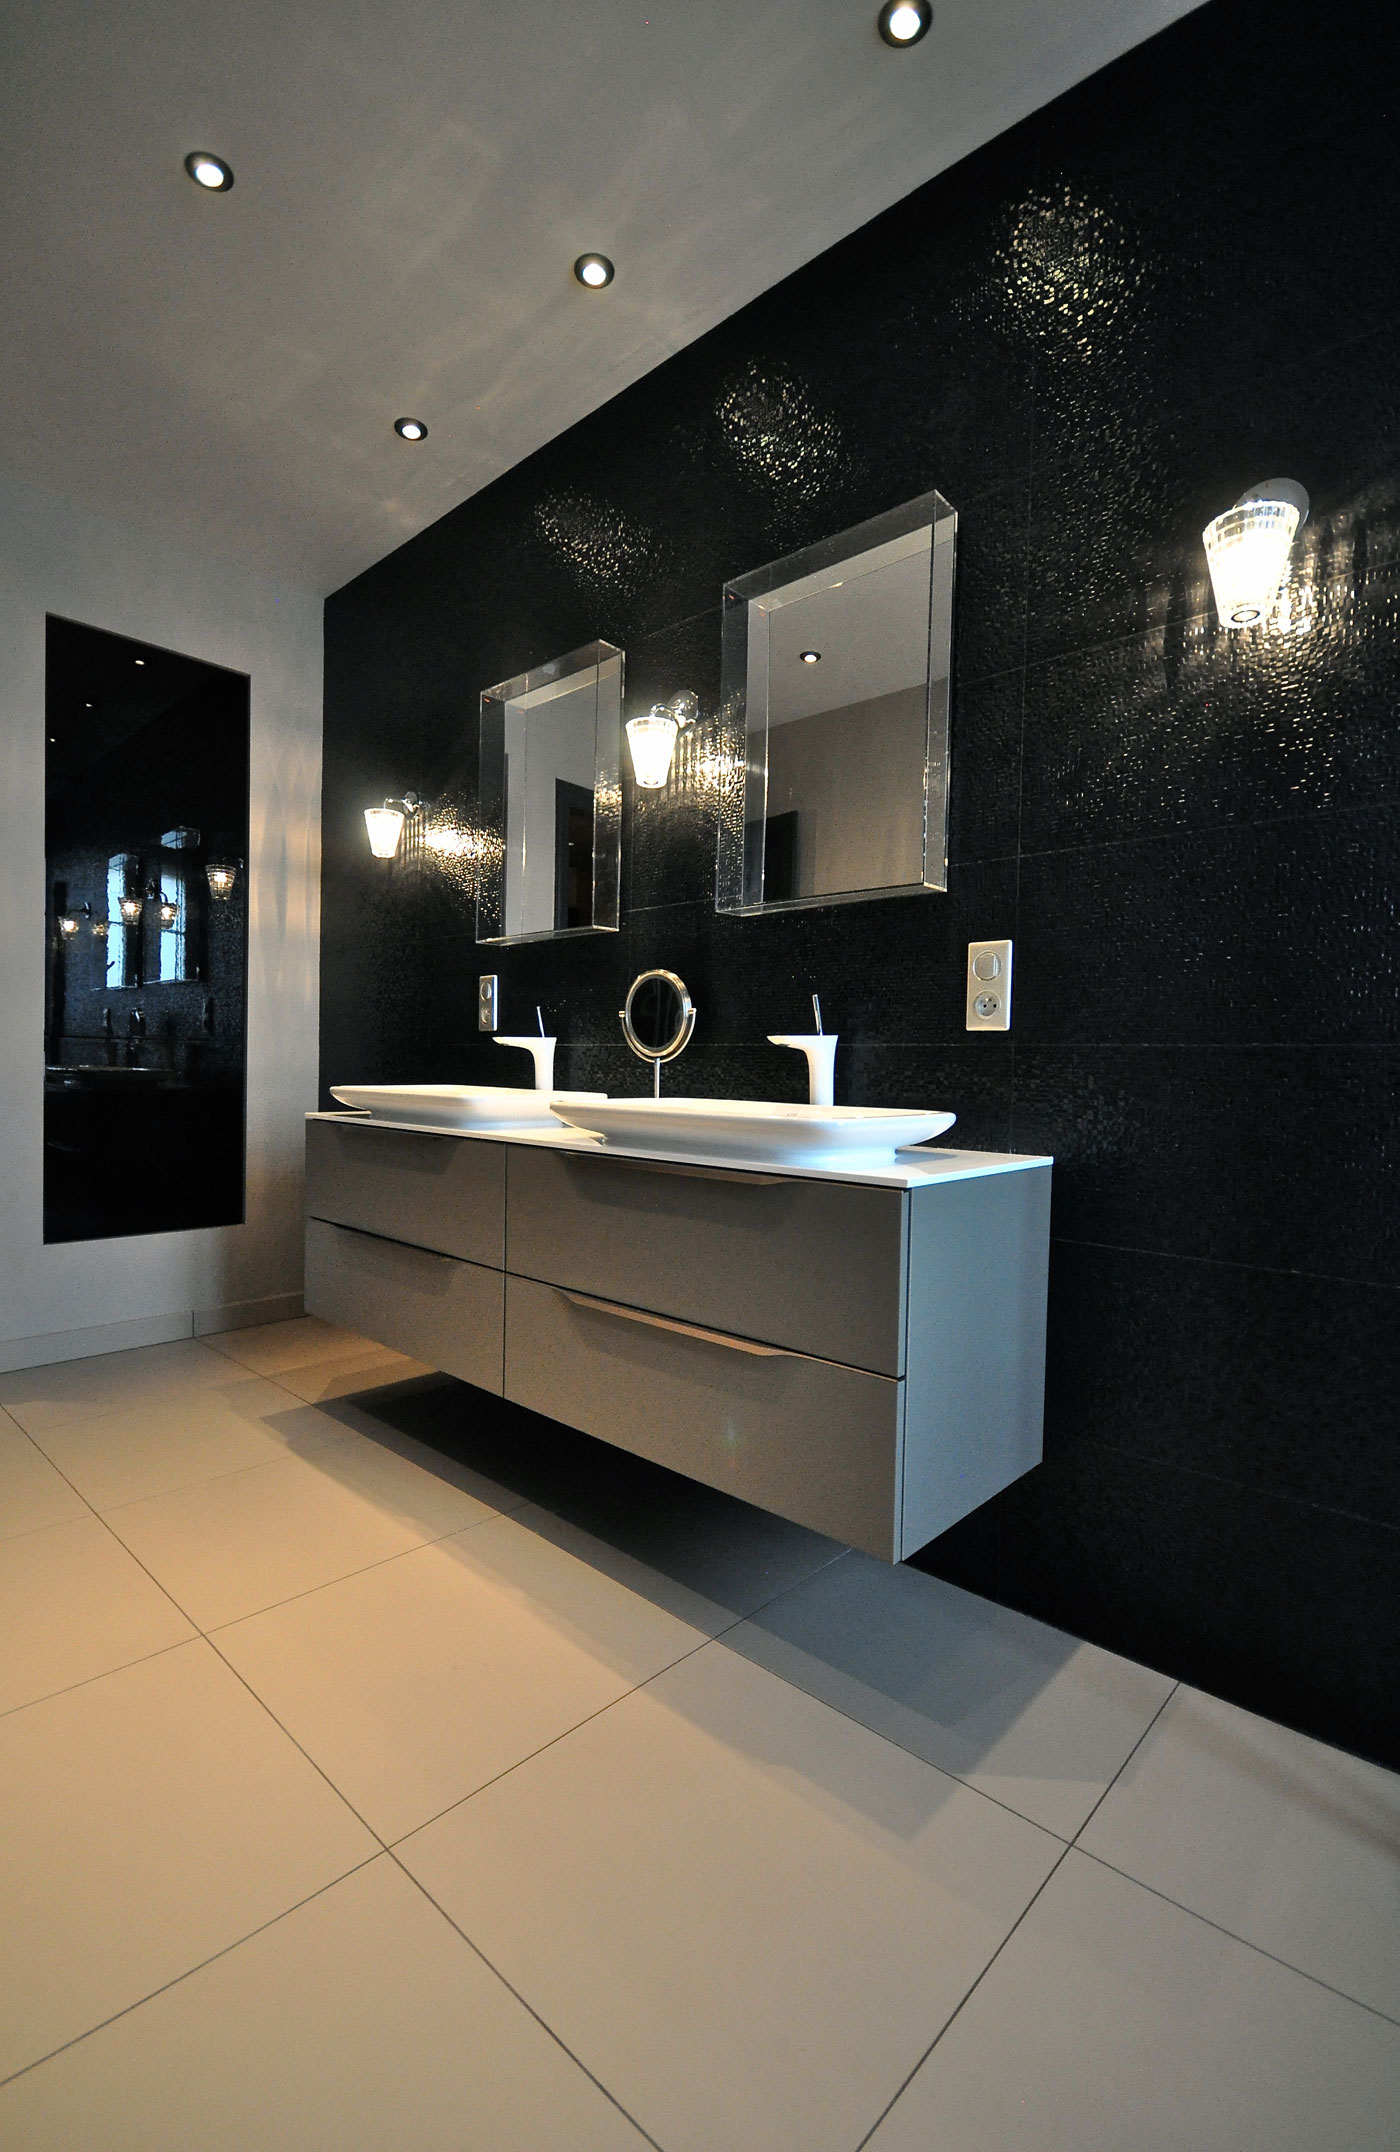 luxury 150m2 duplex apartment near parc sainte marie in. Black Bedroom Furniture Sets. Home Design Ideas